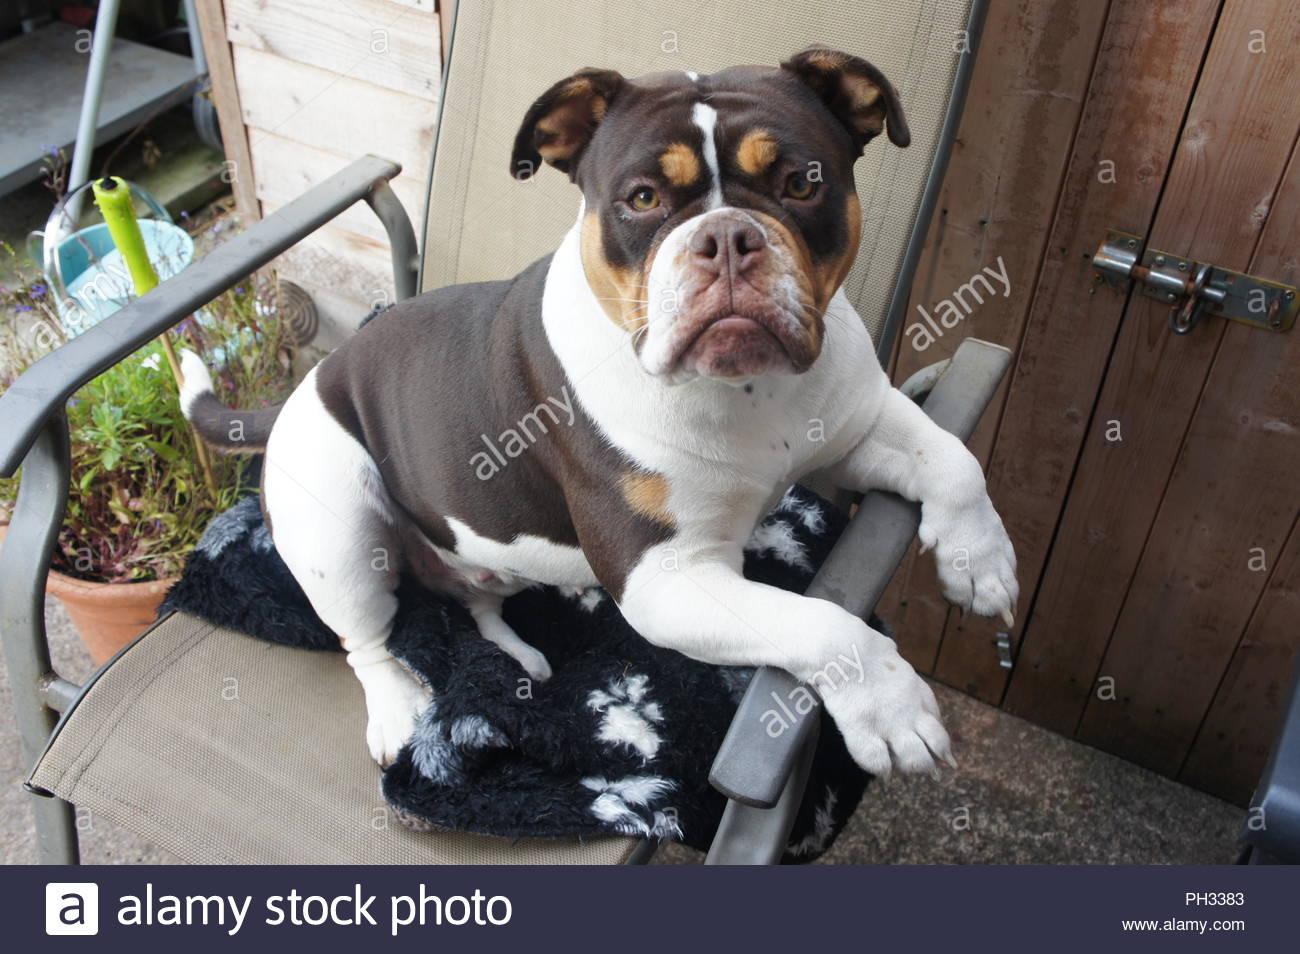 bulldog sat on chair , funny dog ,old tyme bulldog - Stock Image